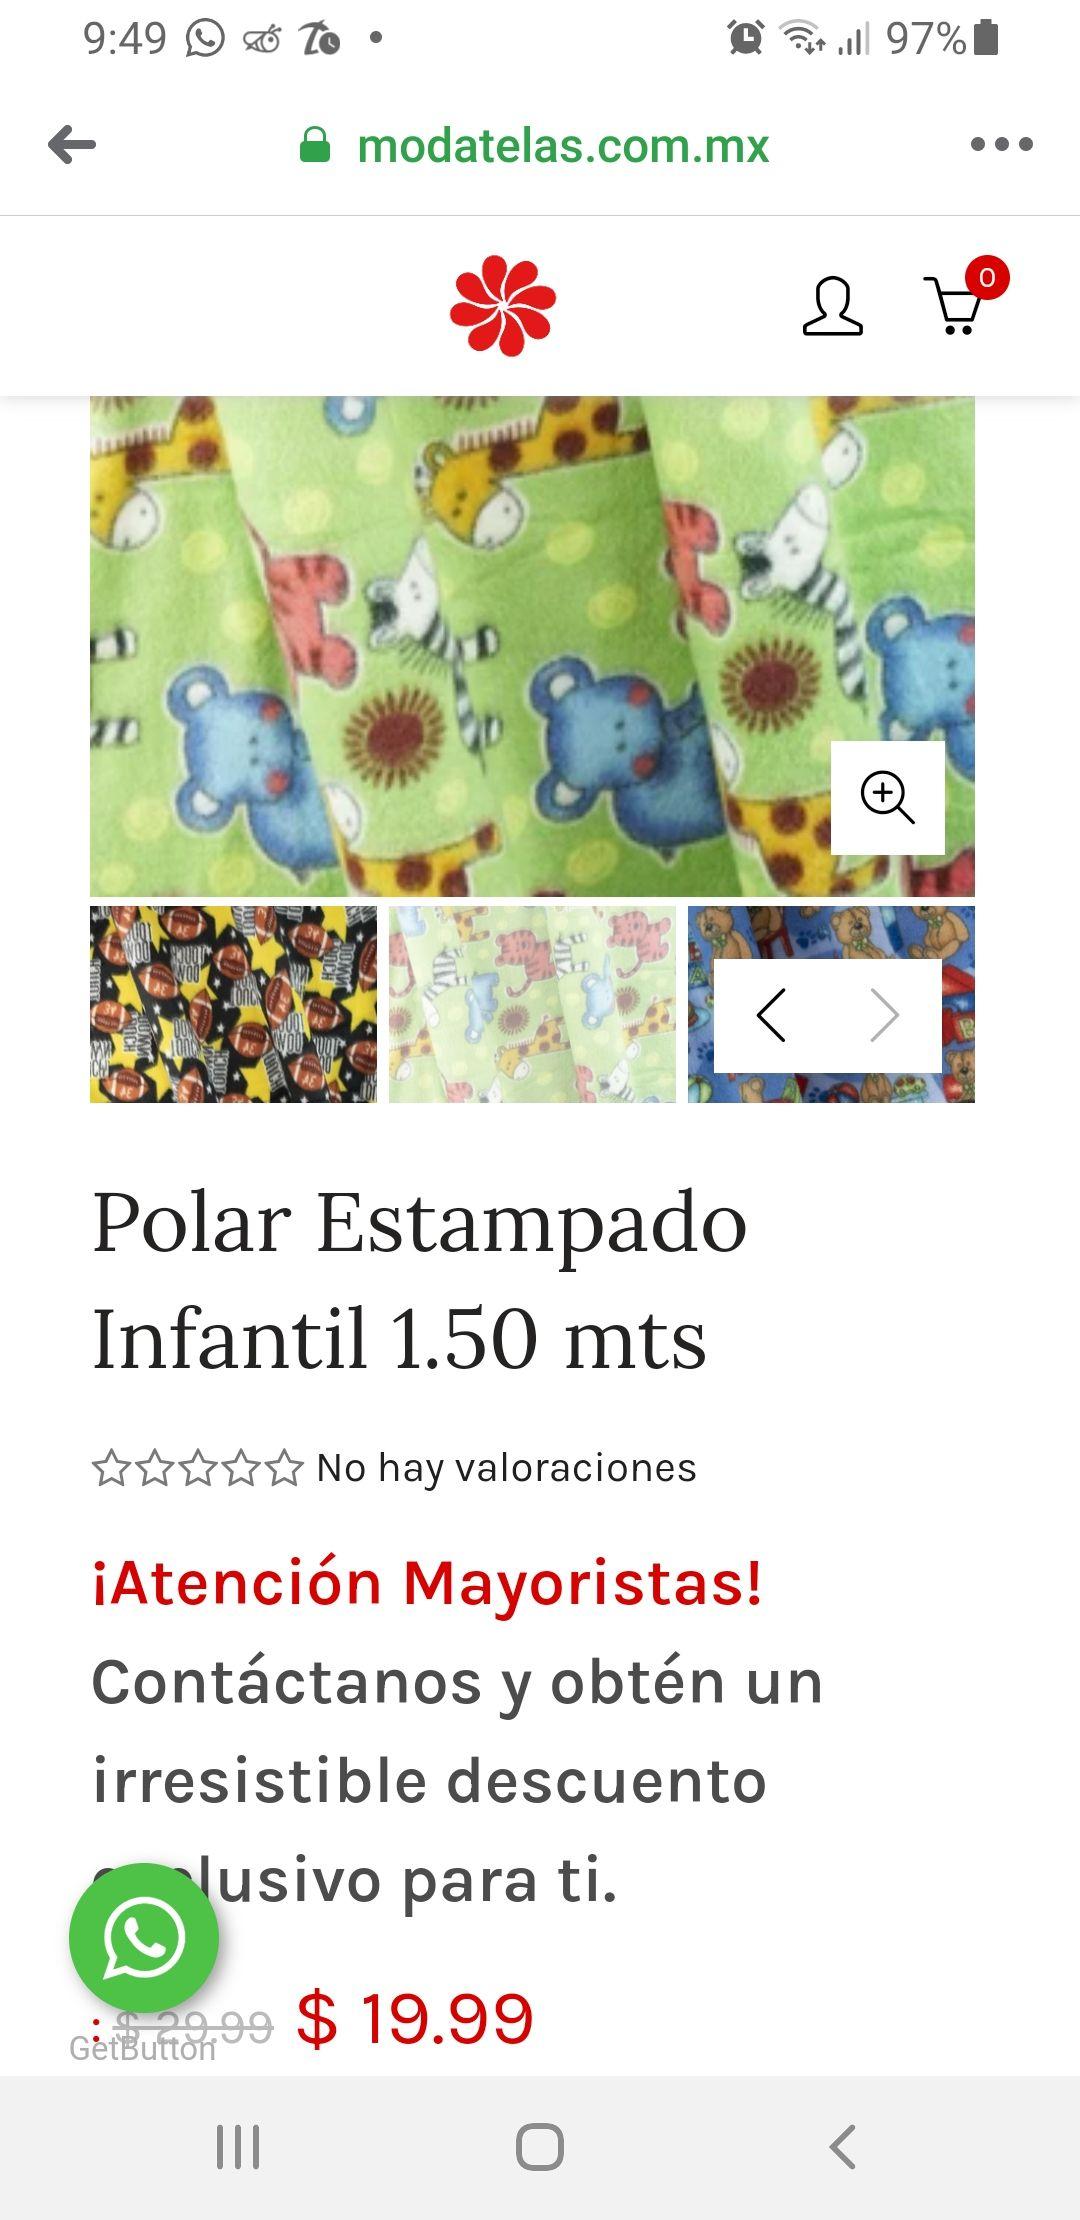 MODATELAs Polar estampado infantil